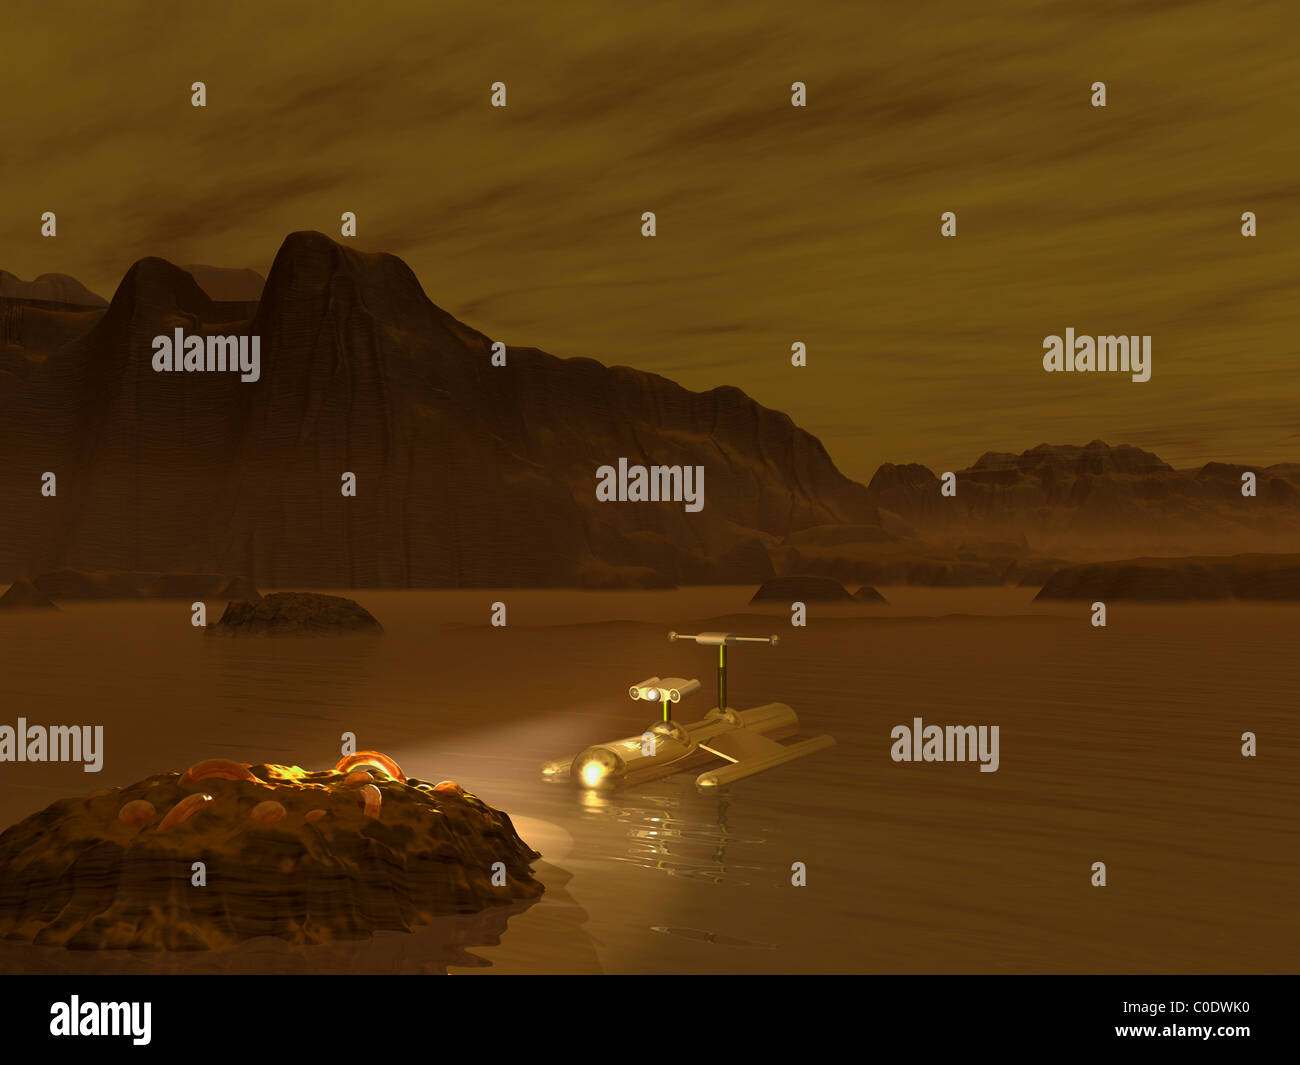 Artist's concept of a robotic probe exploring a frigid ethane lake on Titan. - Stock Image